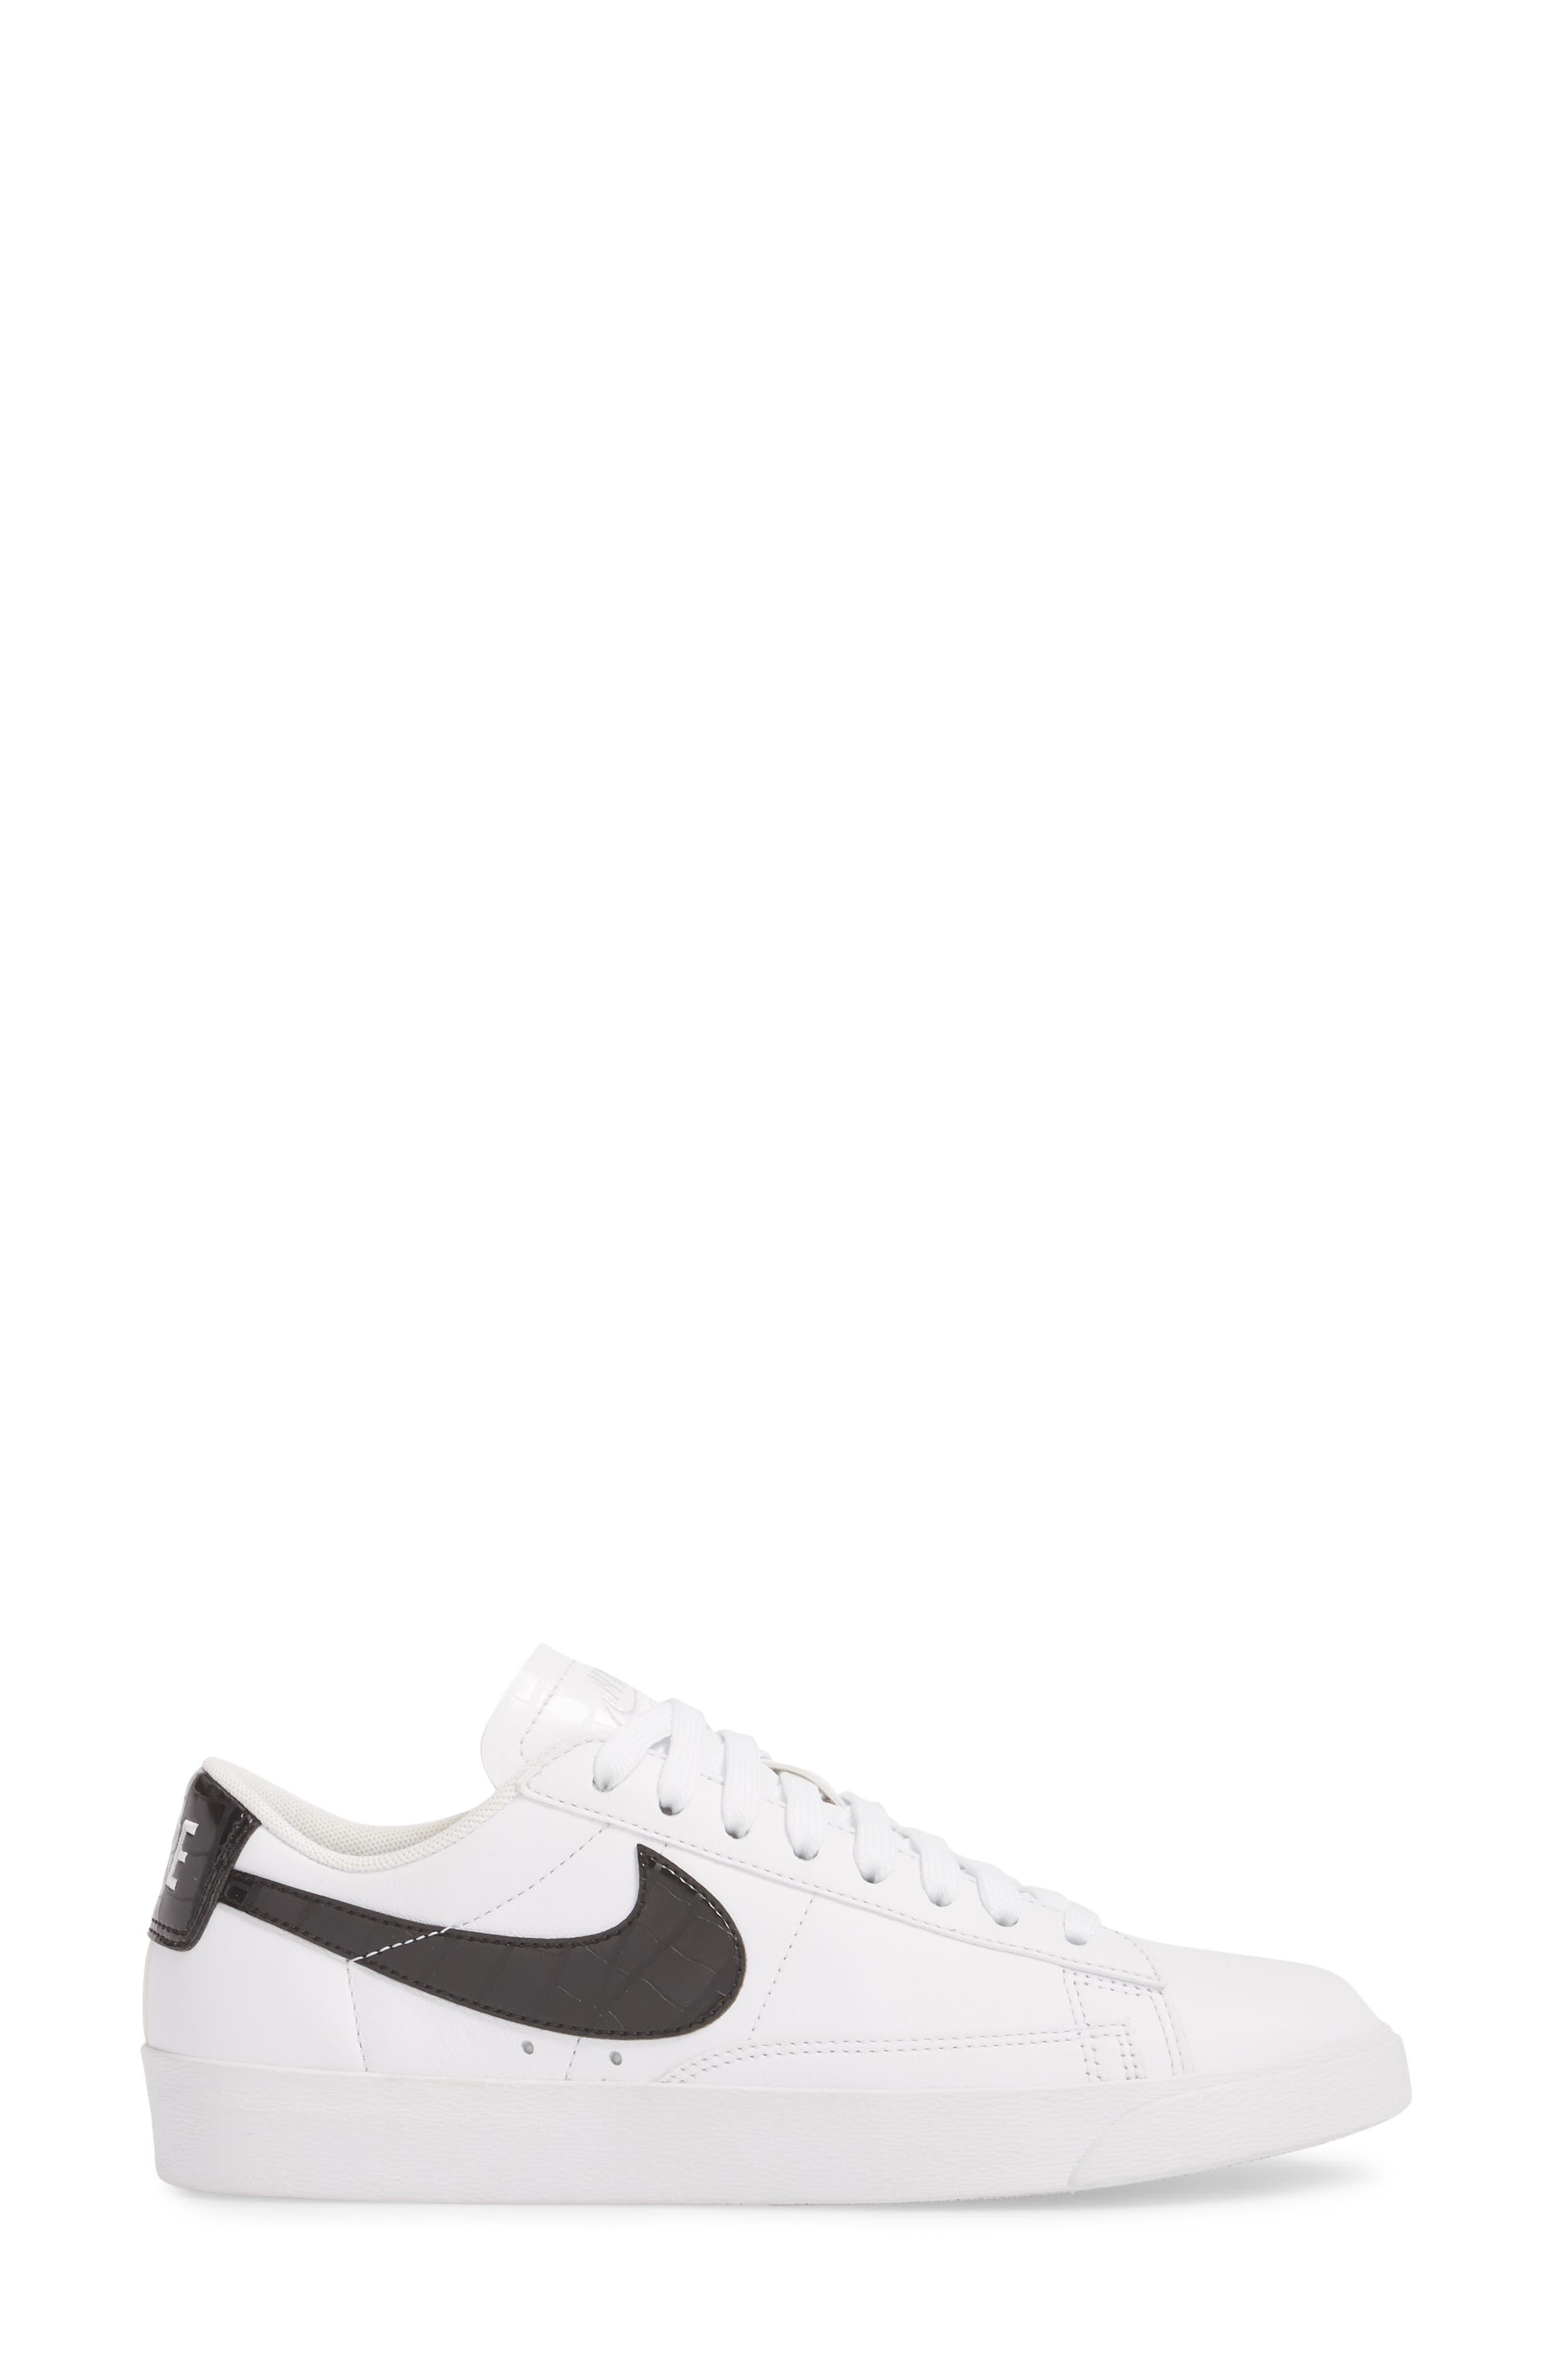 Blazer Low Essential Sneaker,                             Alternate thumbnail 3, color,                             100